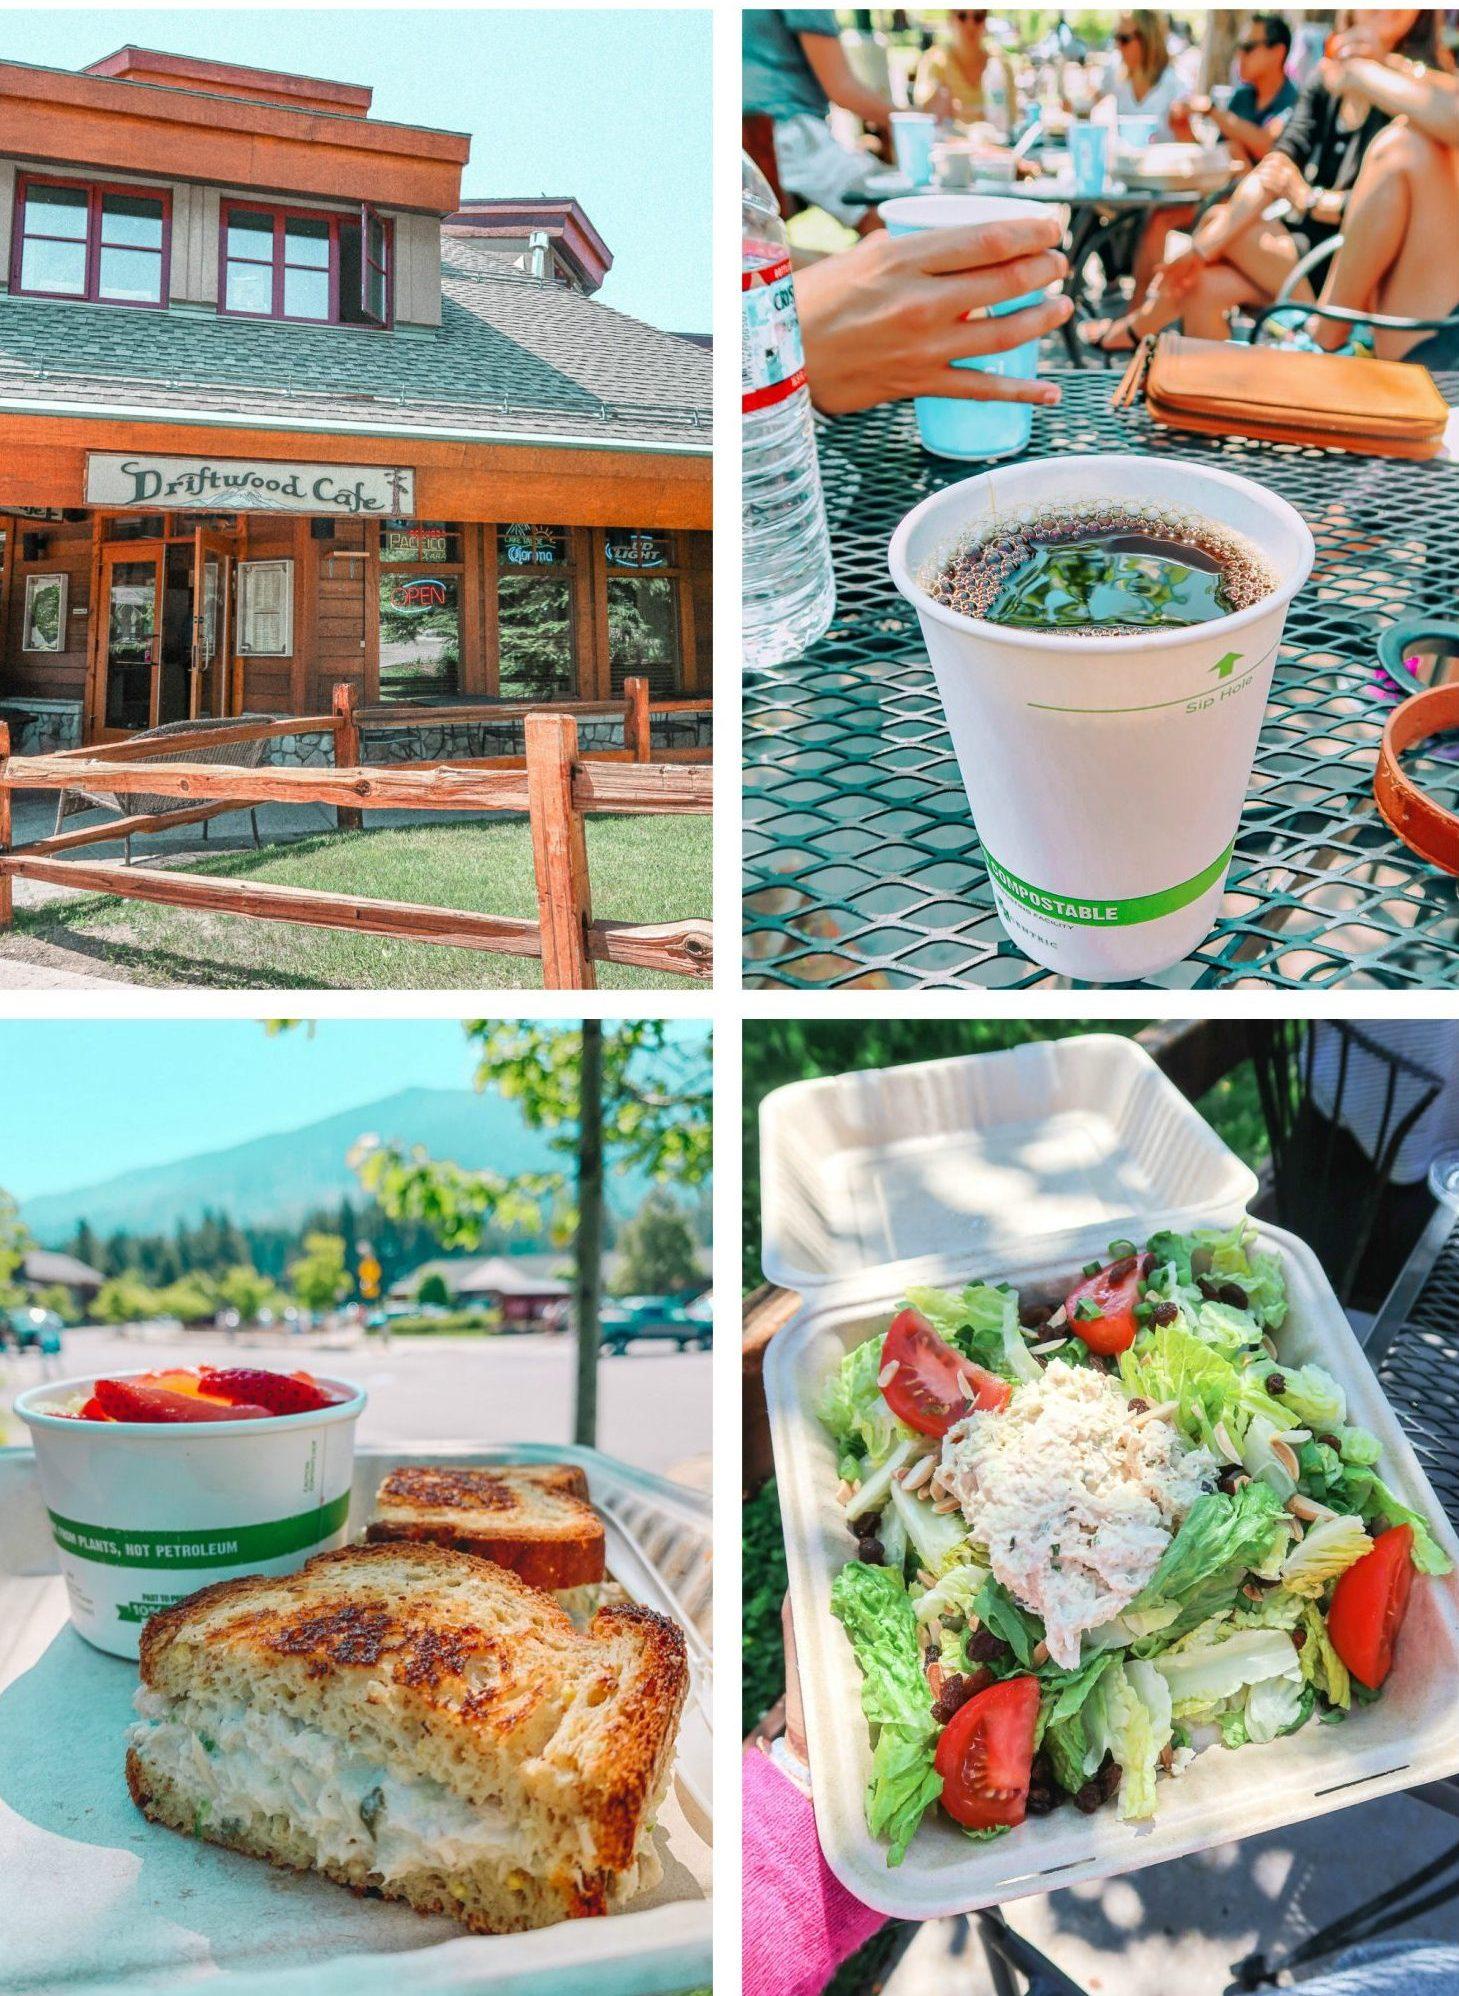 Lake Tahoe South, Travel Blog, Simply Taralynn, Travel Blogger, Traveling, Blog, Travel, Mountains, Edgewood Bistro, California, Nevada, Summer, Trips, Traveling to Tahoe, Lake Tahoe, Where to eat, drink, stay, boating, see, things to do in Lake Tahoe, summer in lake tahoe, driftwood cafe, vegan, healthy, dairy free, gluten free, food